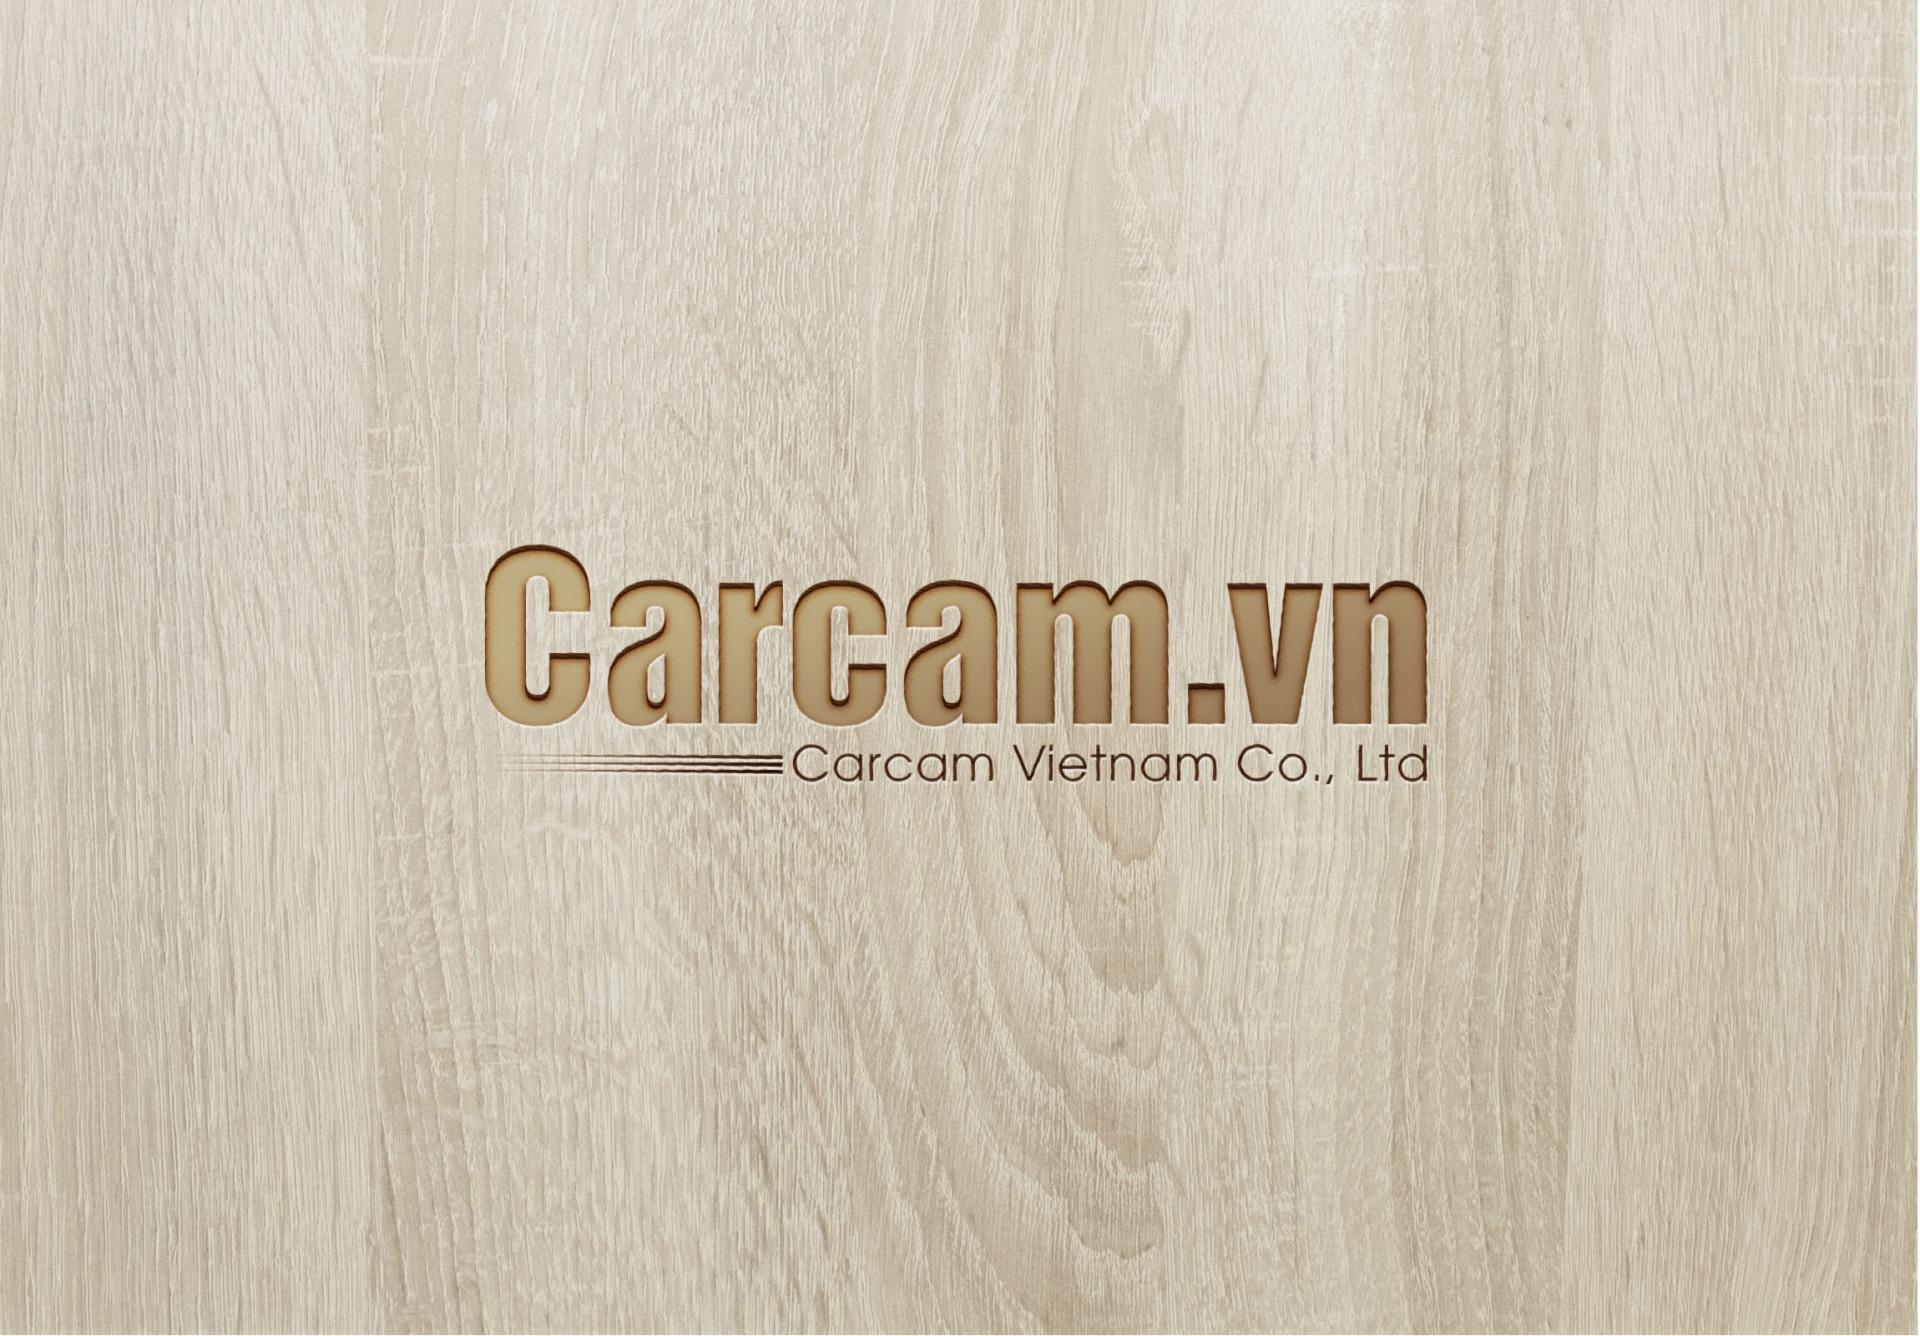 logo Carcam Vietnam